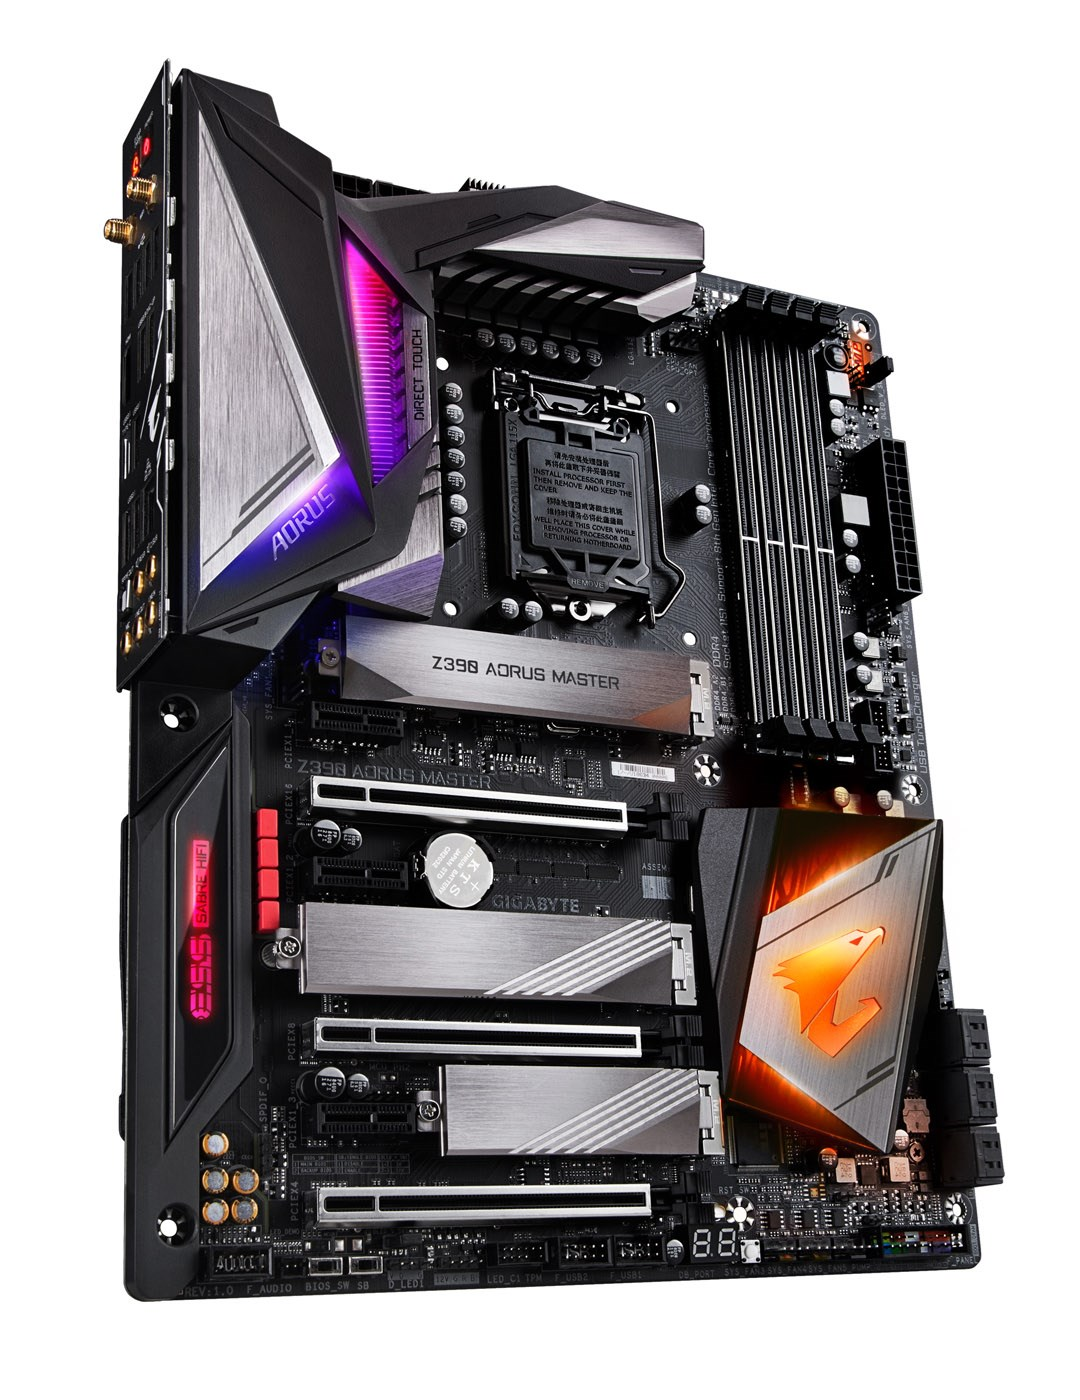 Gigabyte Z390 AORUS MASTER ATX Motherboard for Intel LGA1151 CPUs